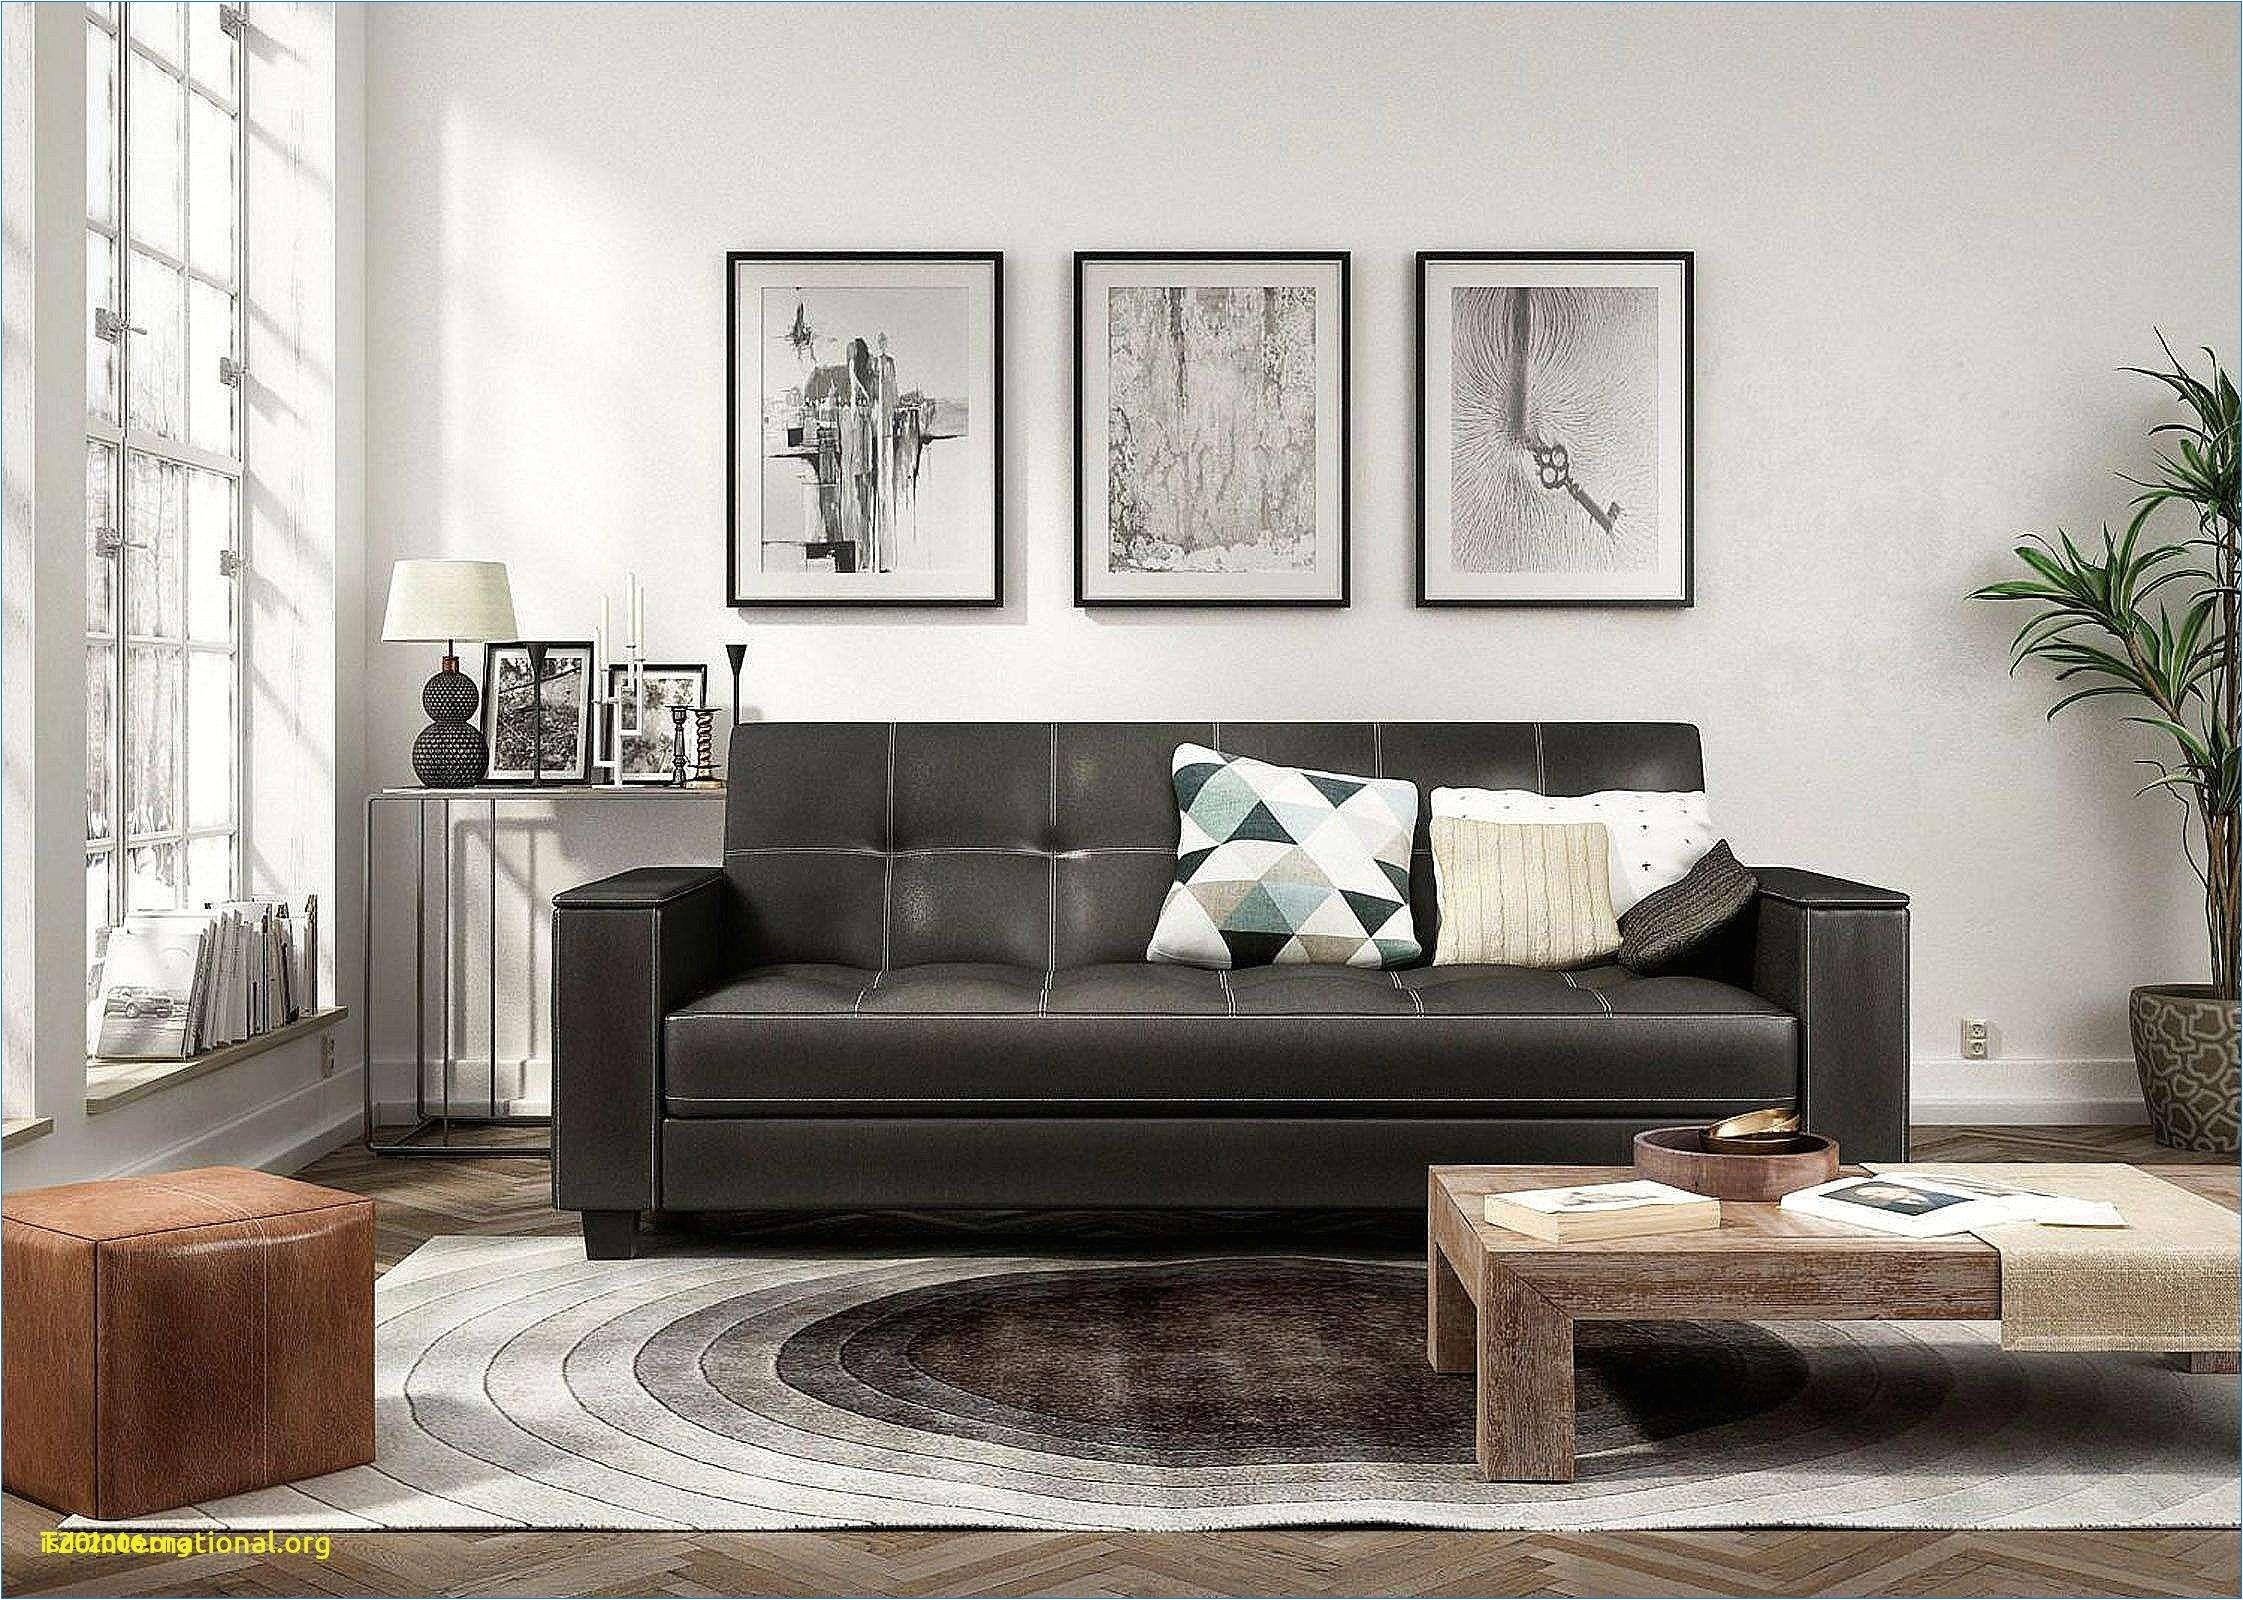 Modern Living Room Furniture New Gunstige sofa Macys Furniture 0d